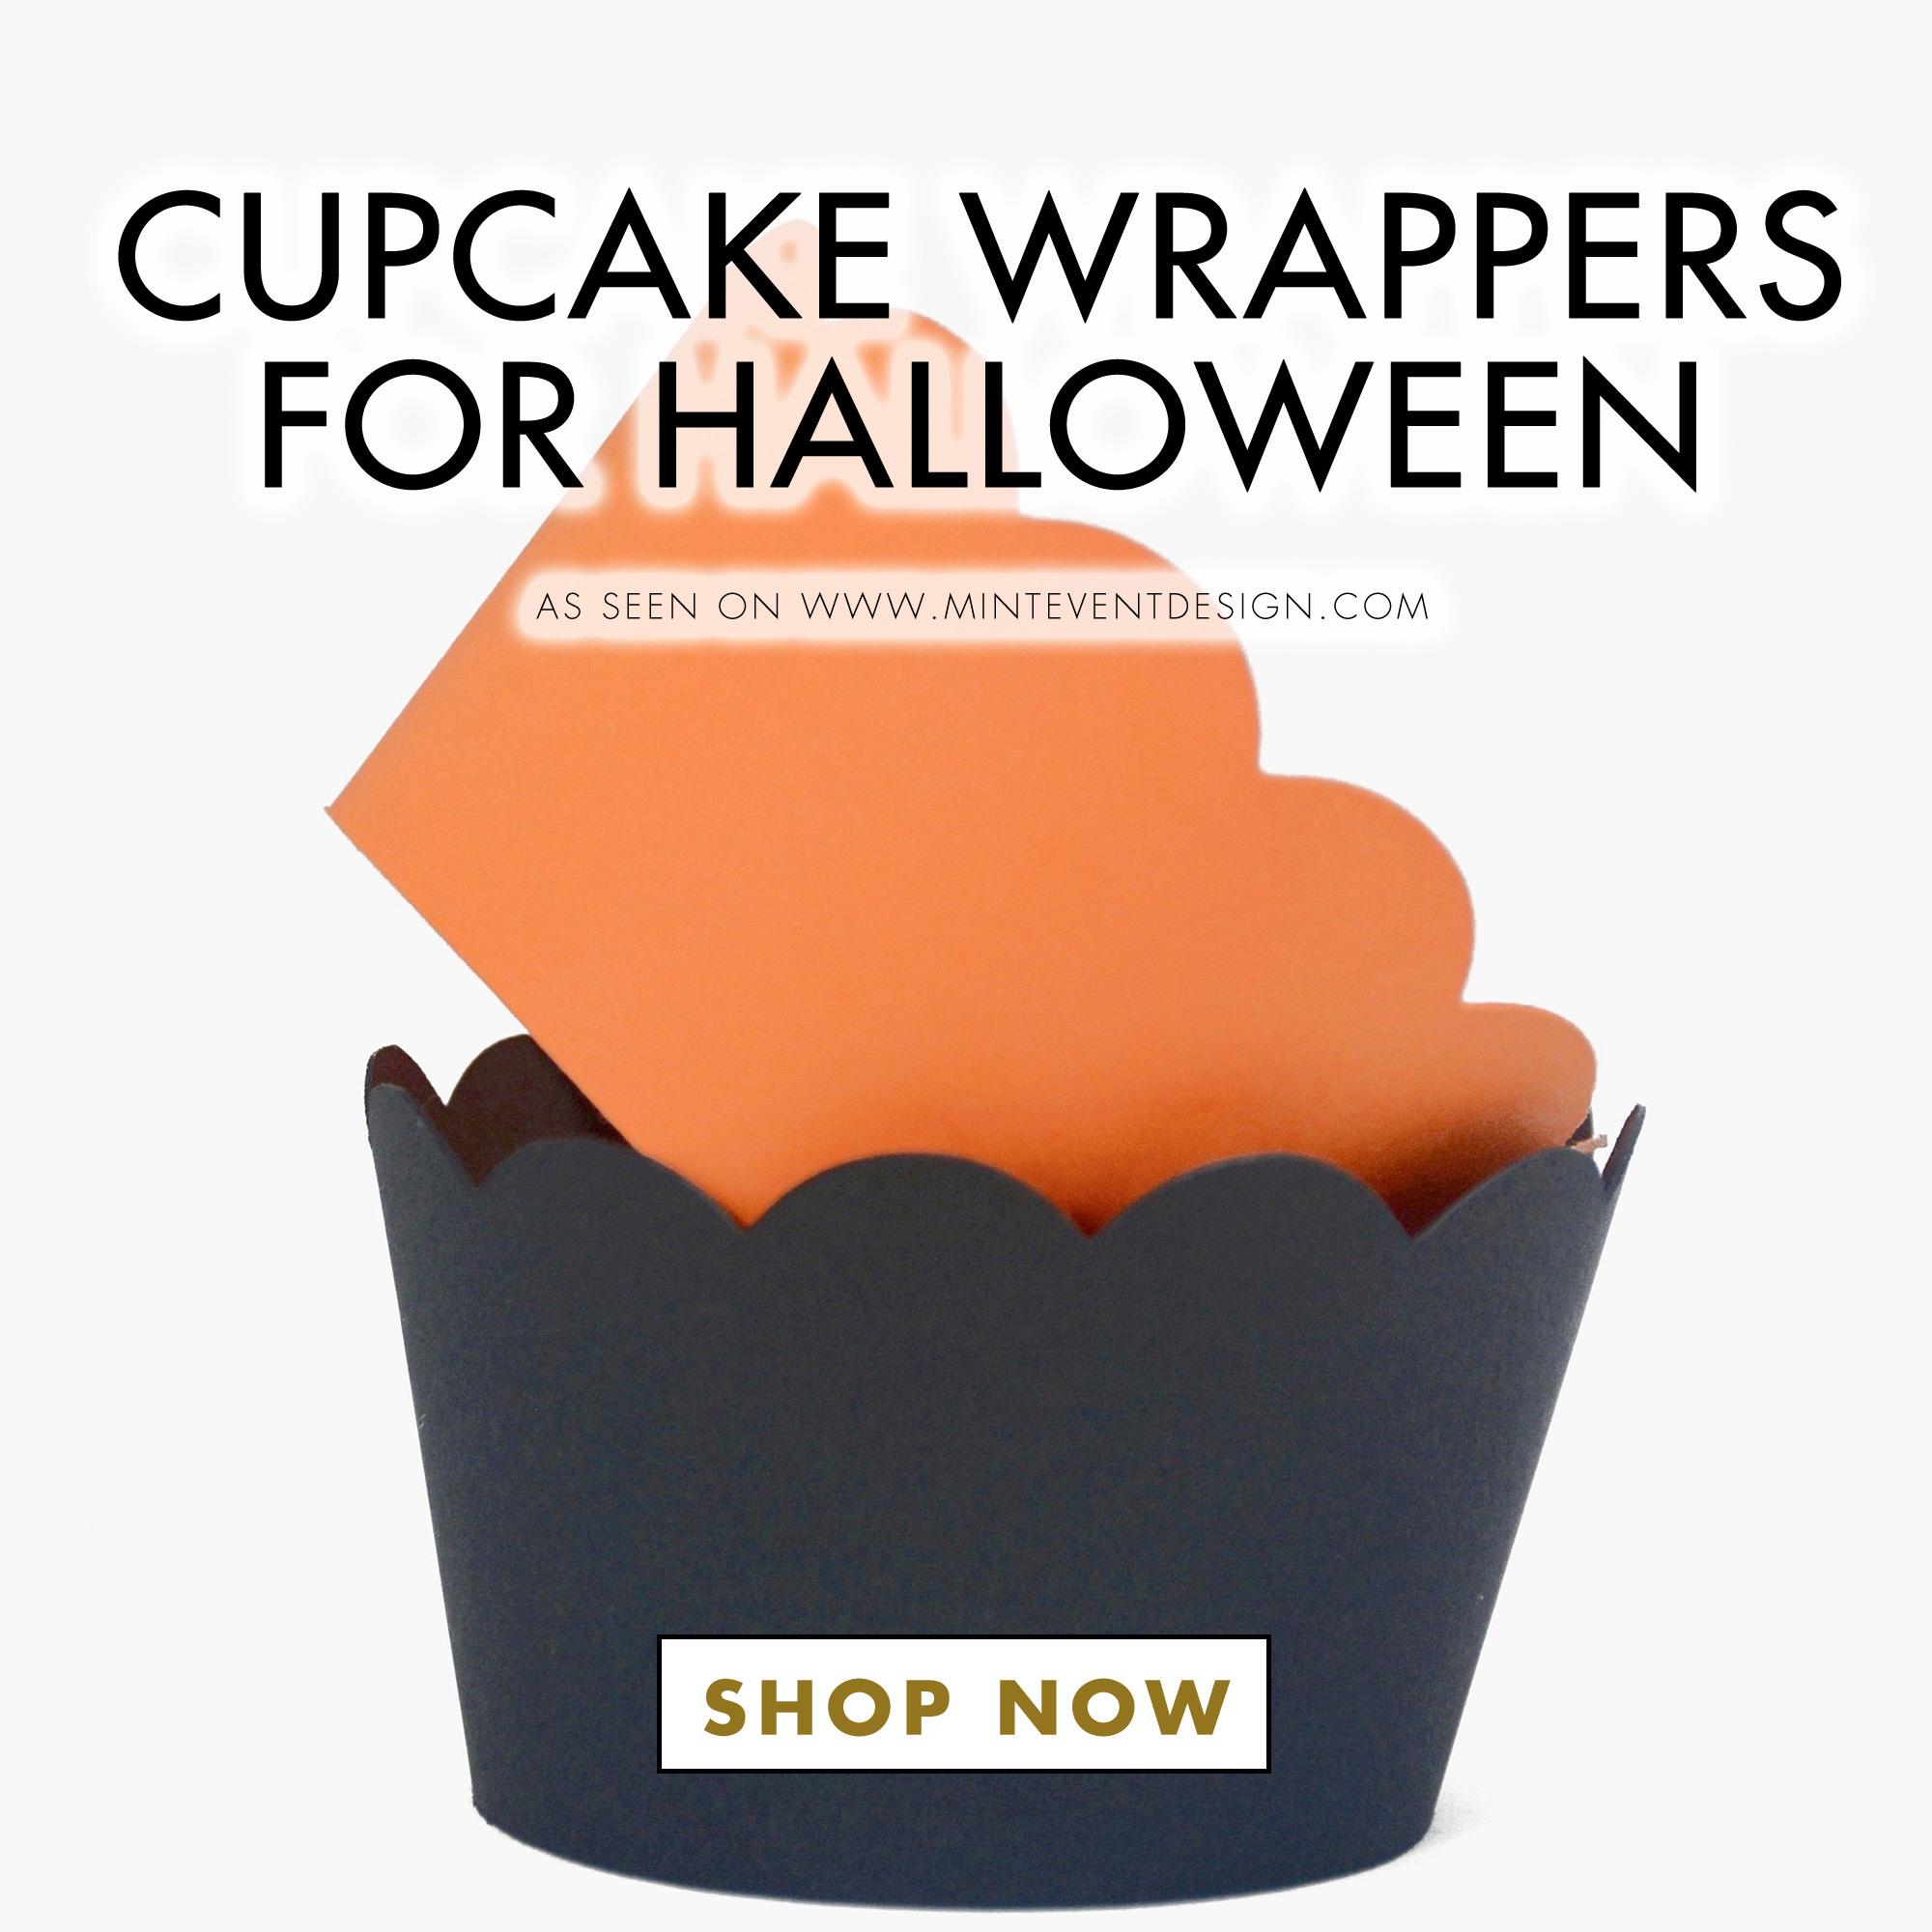 shop-cupcake-wrappers-mint-event-design.jpg